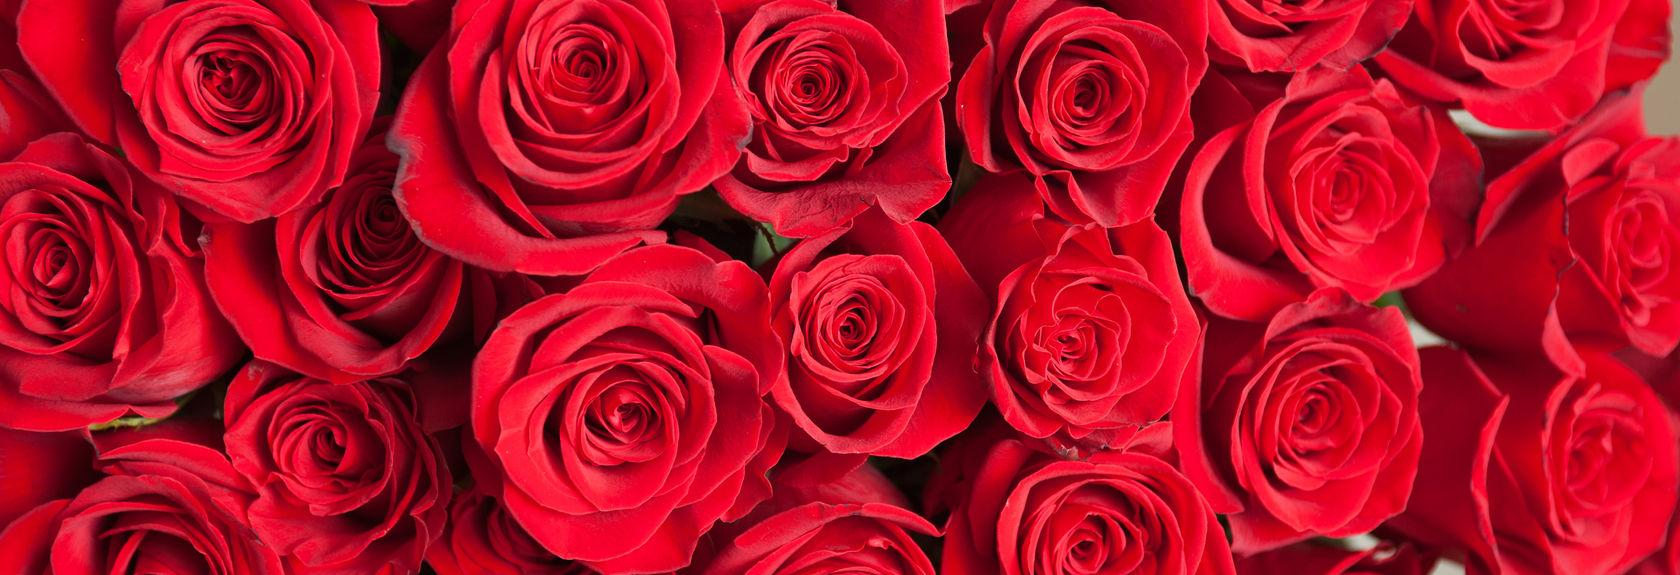 A & S Whitestone Florist & Nursery banner Whitestone, NY